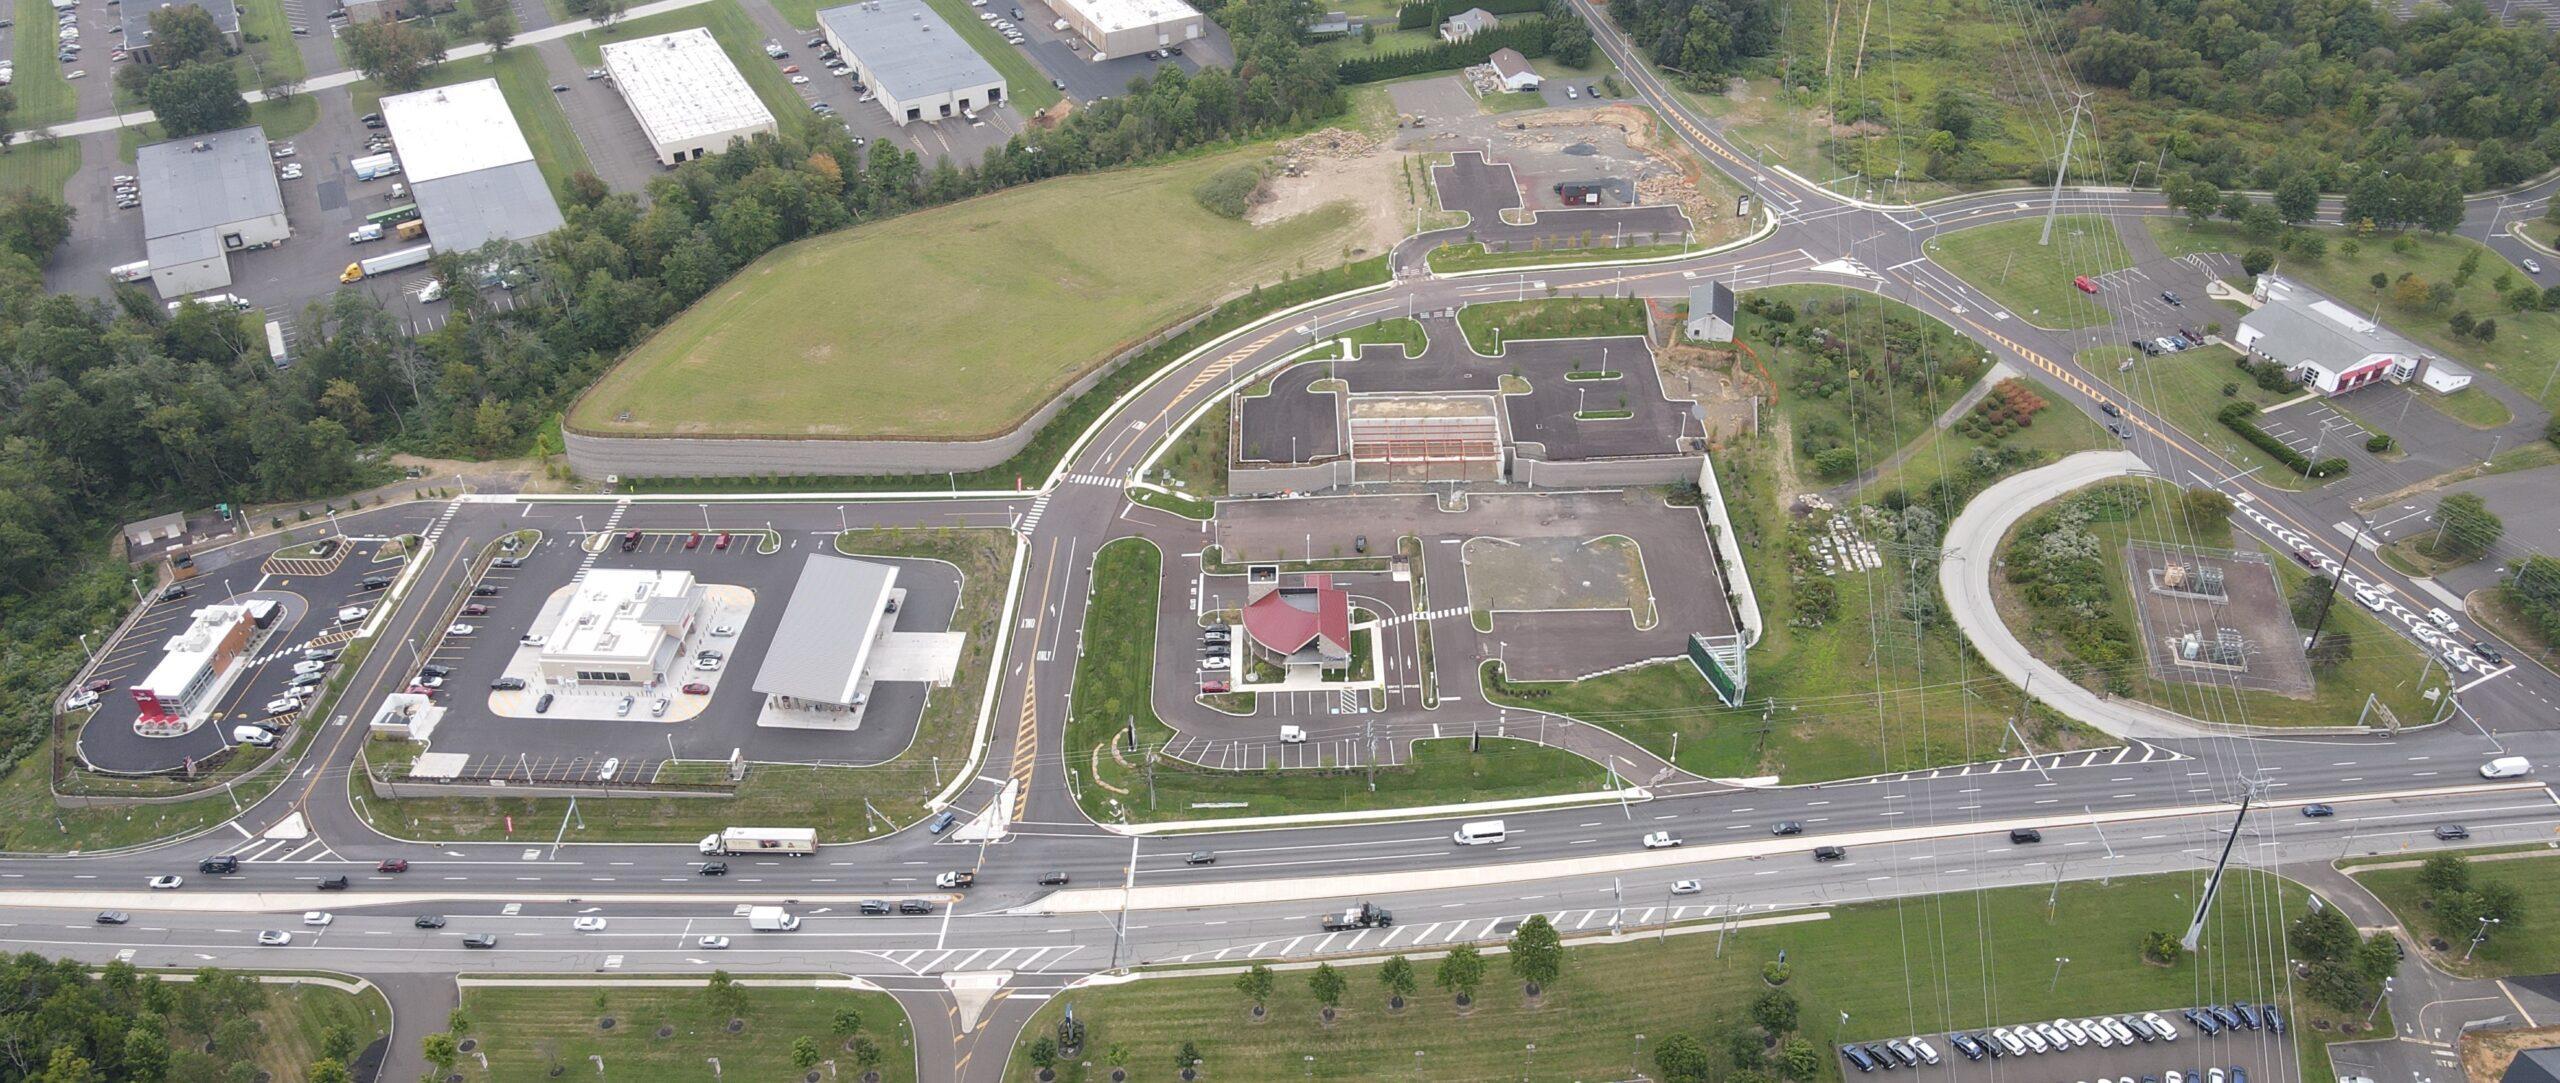 Higher Rock Development – Montgomery Twp, PA